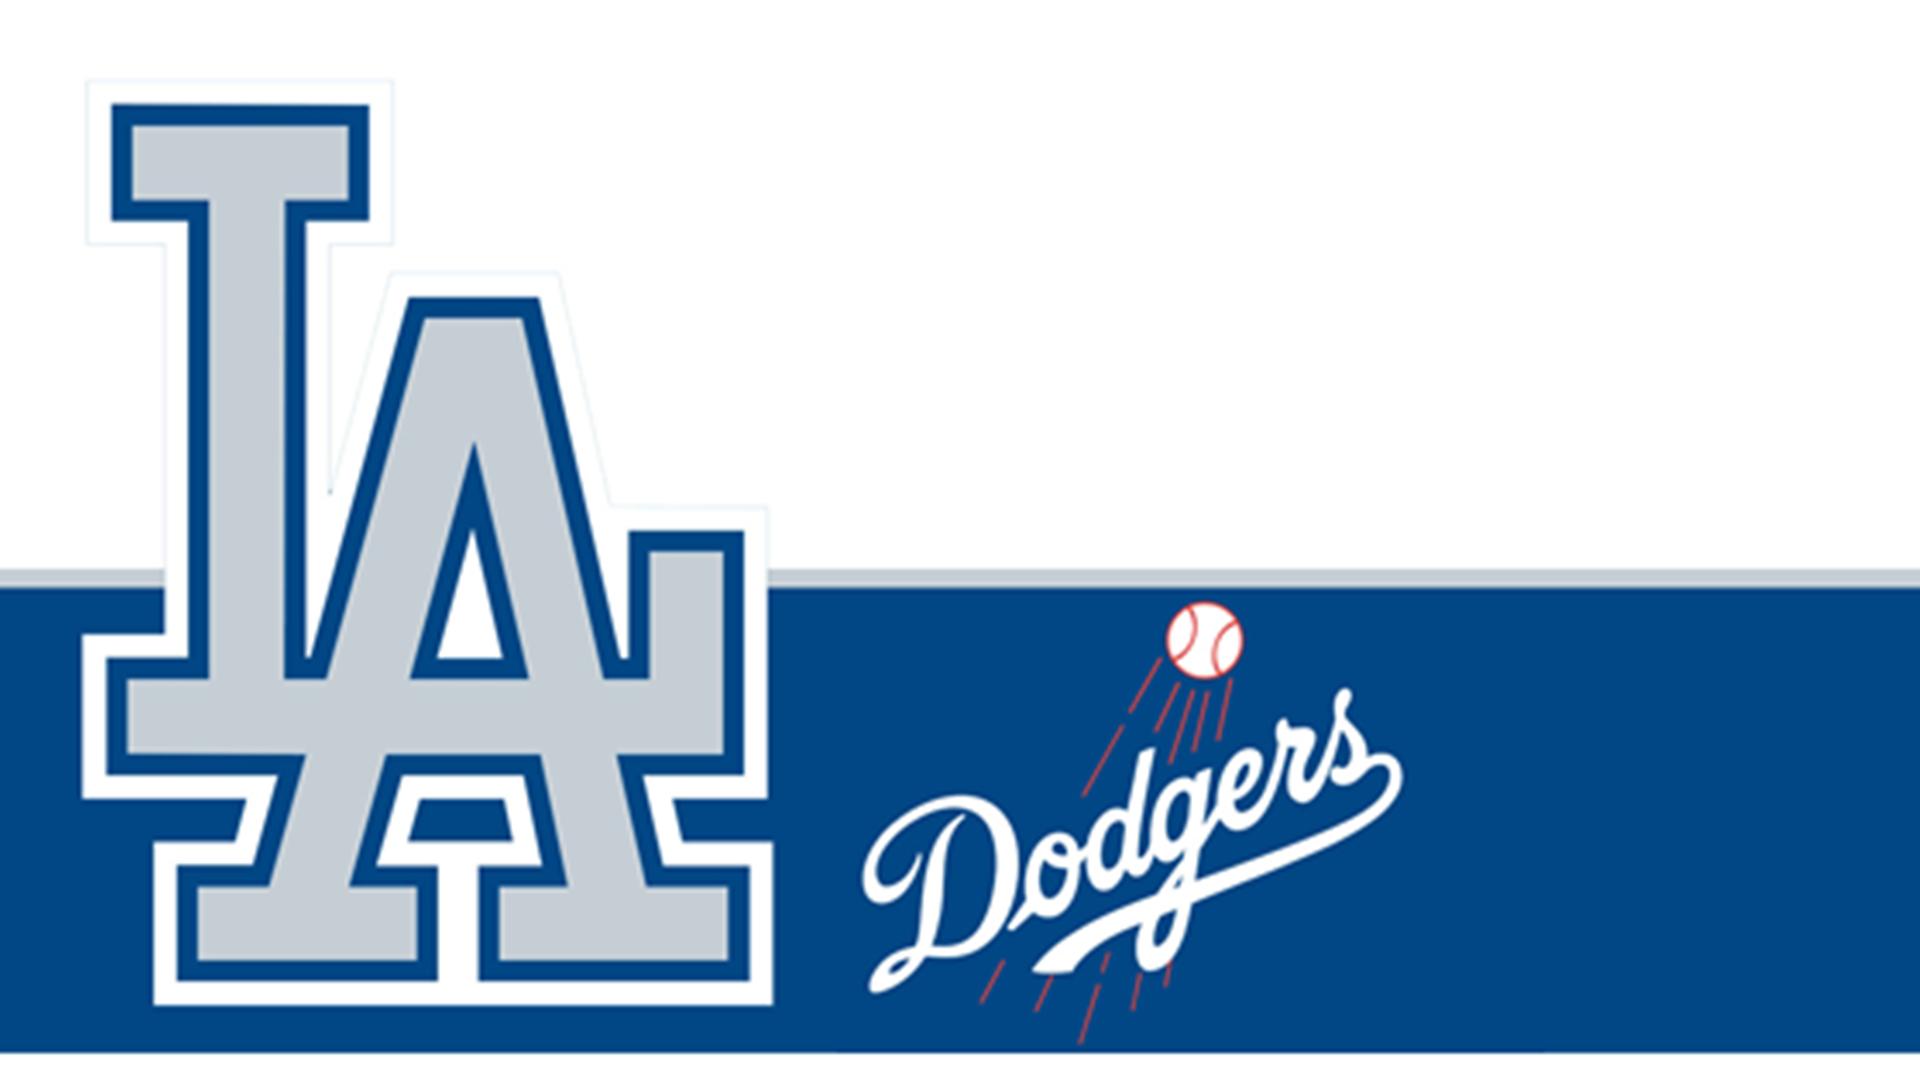 Los Angeles Dodgers Wallpaper Dodgers, Backgrounds free